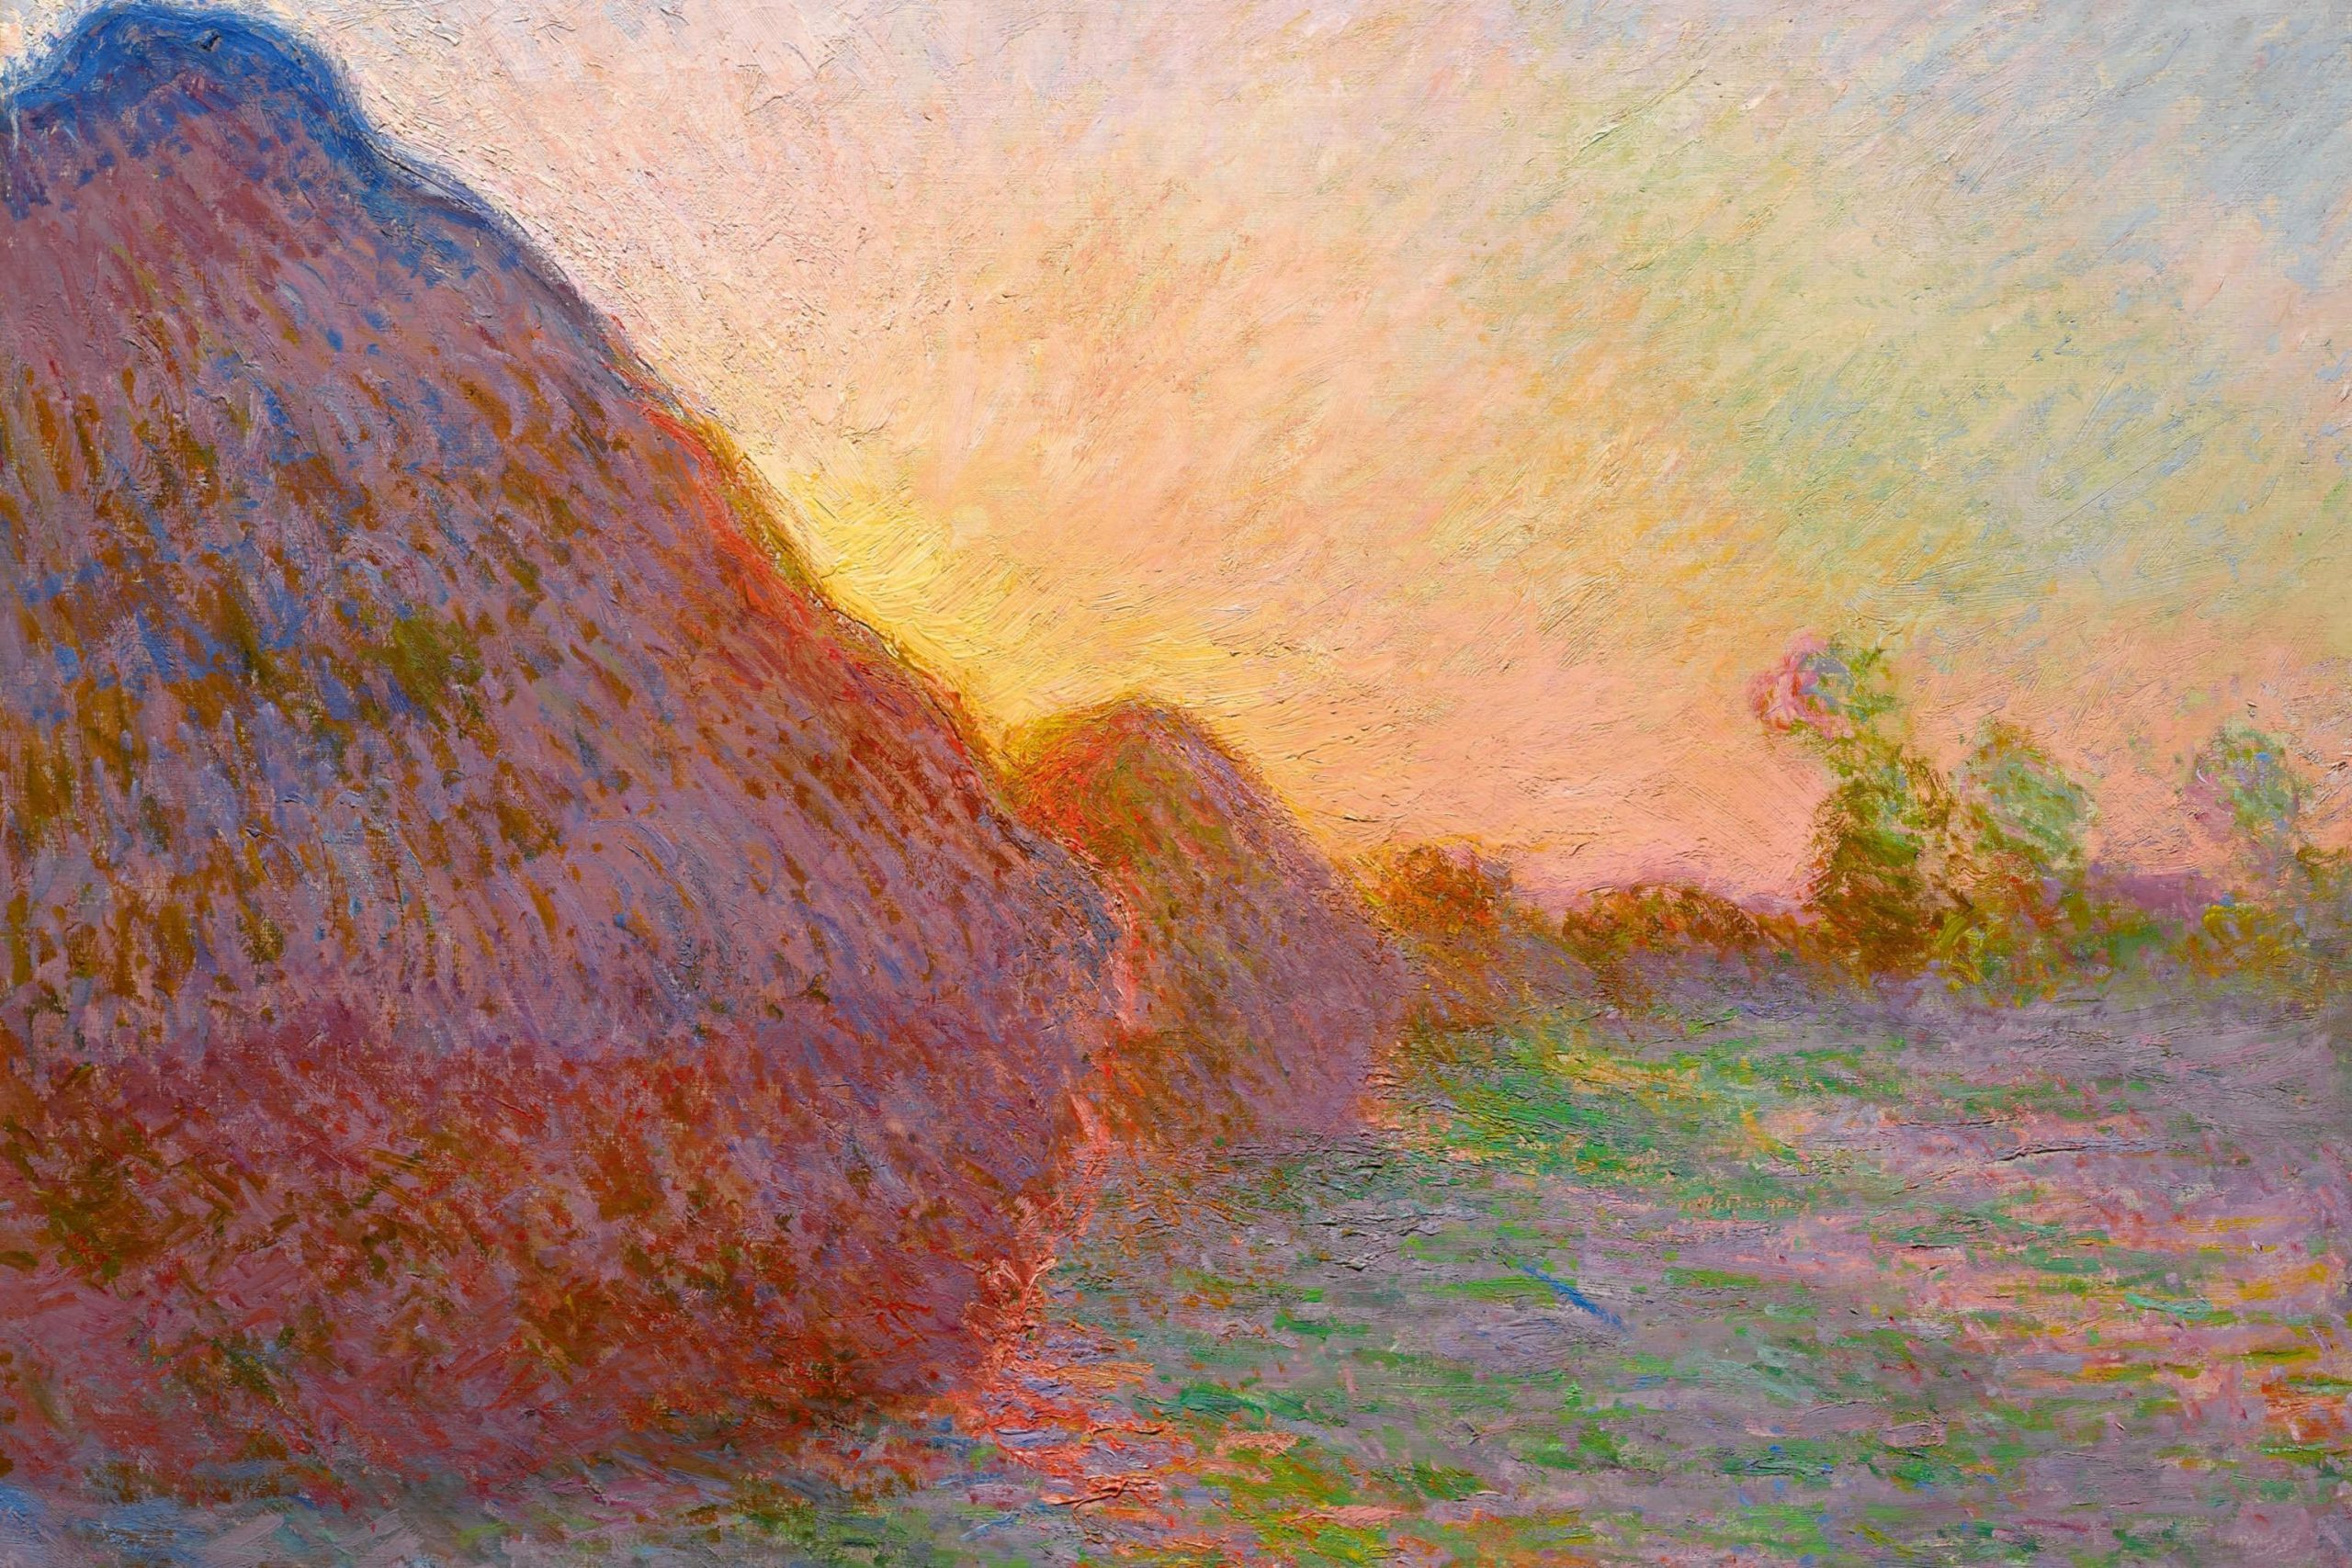 Claude Monet, Meules, 1890